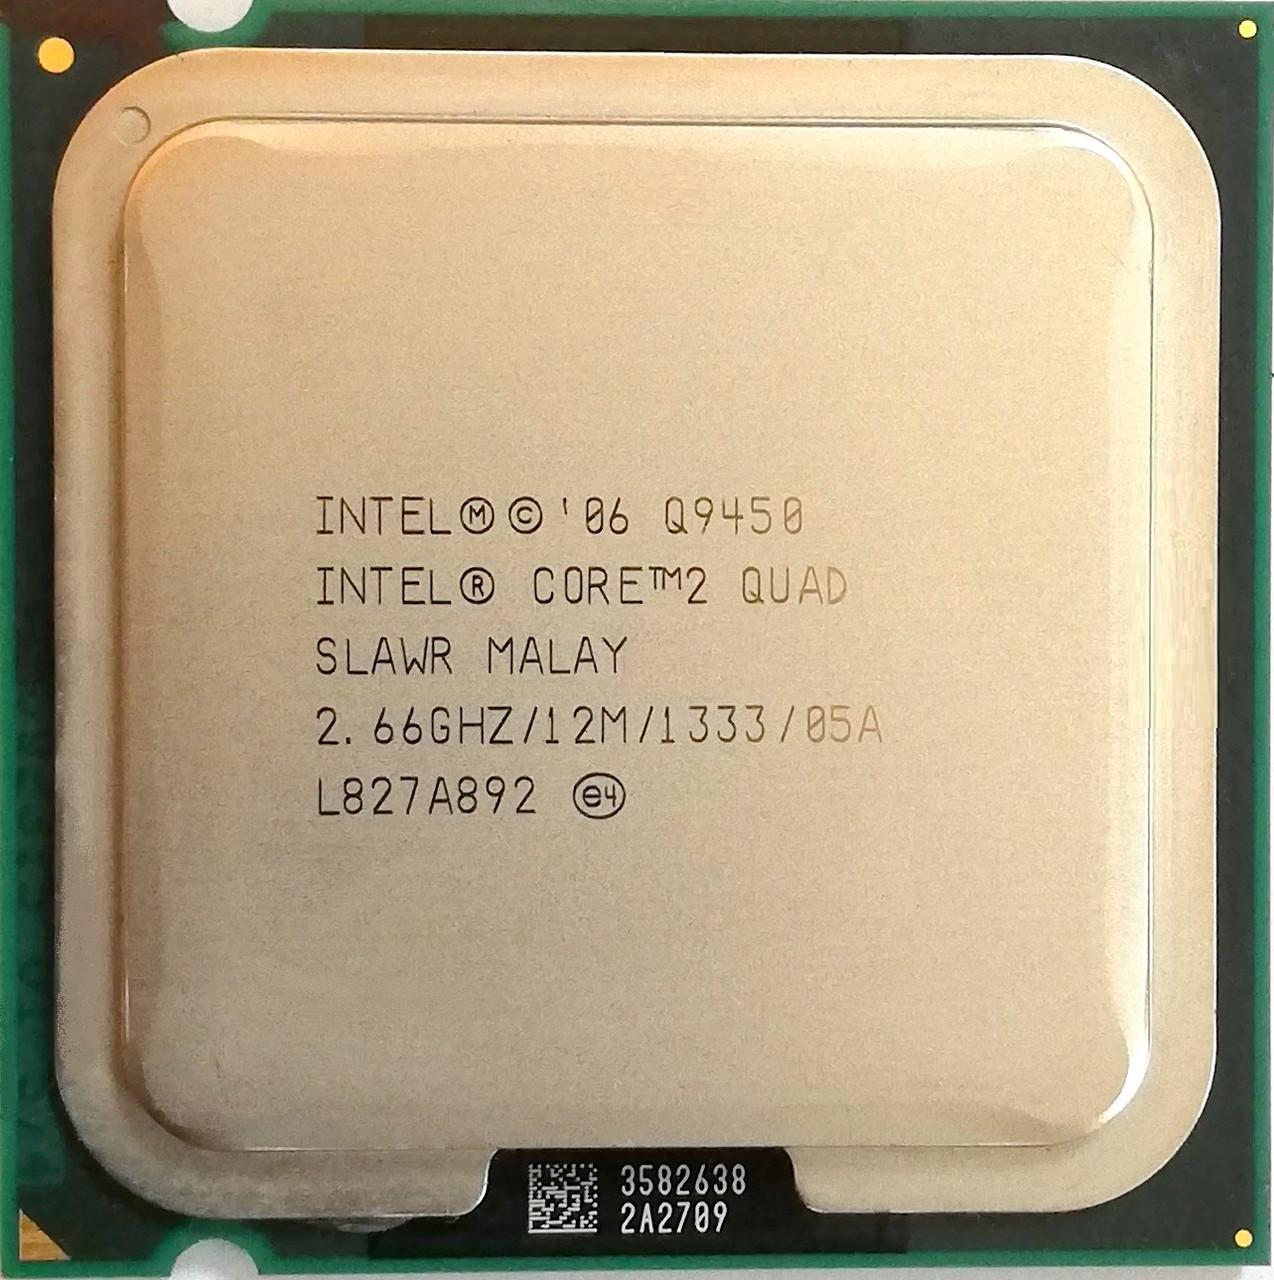 Процессор Intel Core 2 Quad Q9450 C1 SLAWR 2.66GHz 12M Cache 1333 MHz FSB Socket 775 Б/У